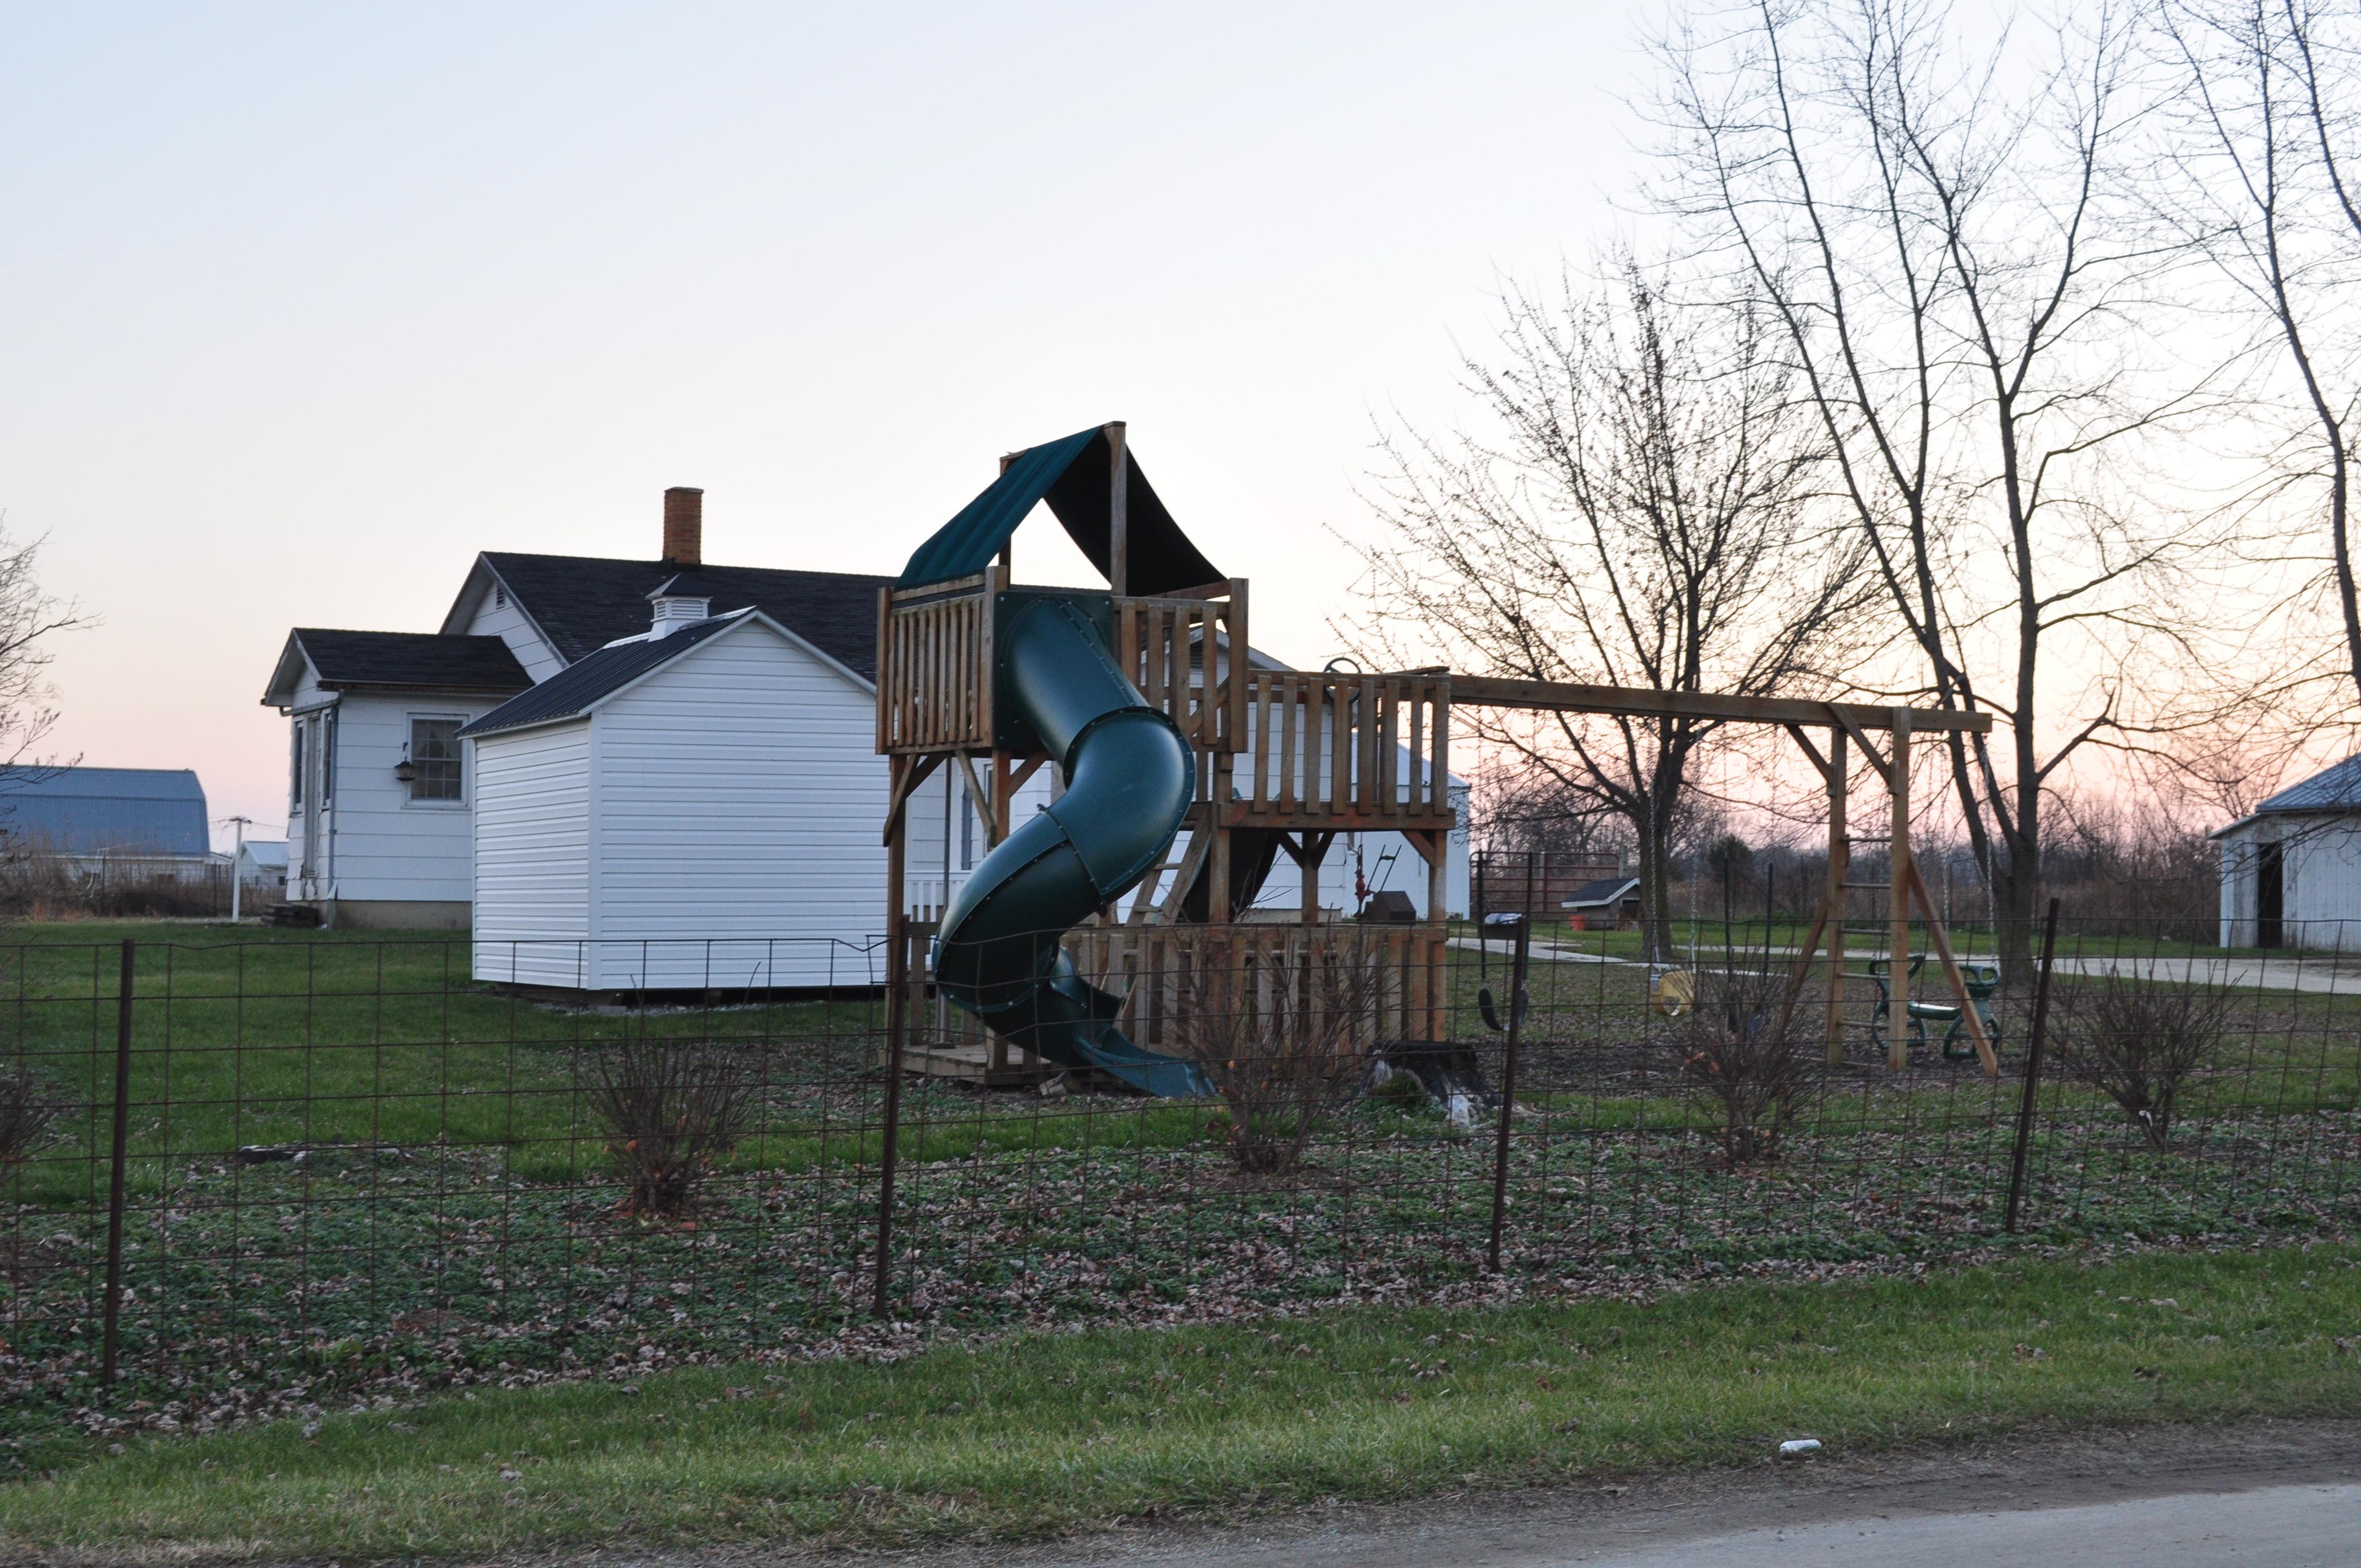 Amish playgrounds